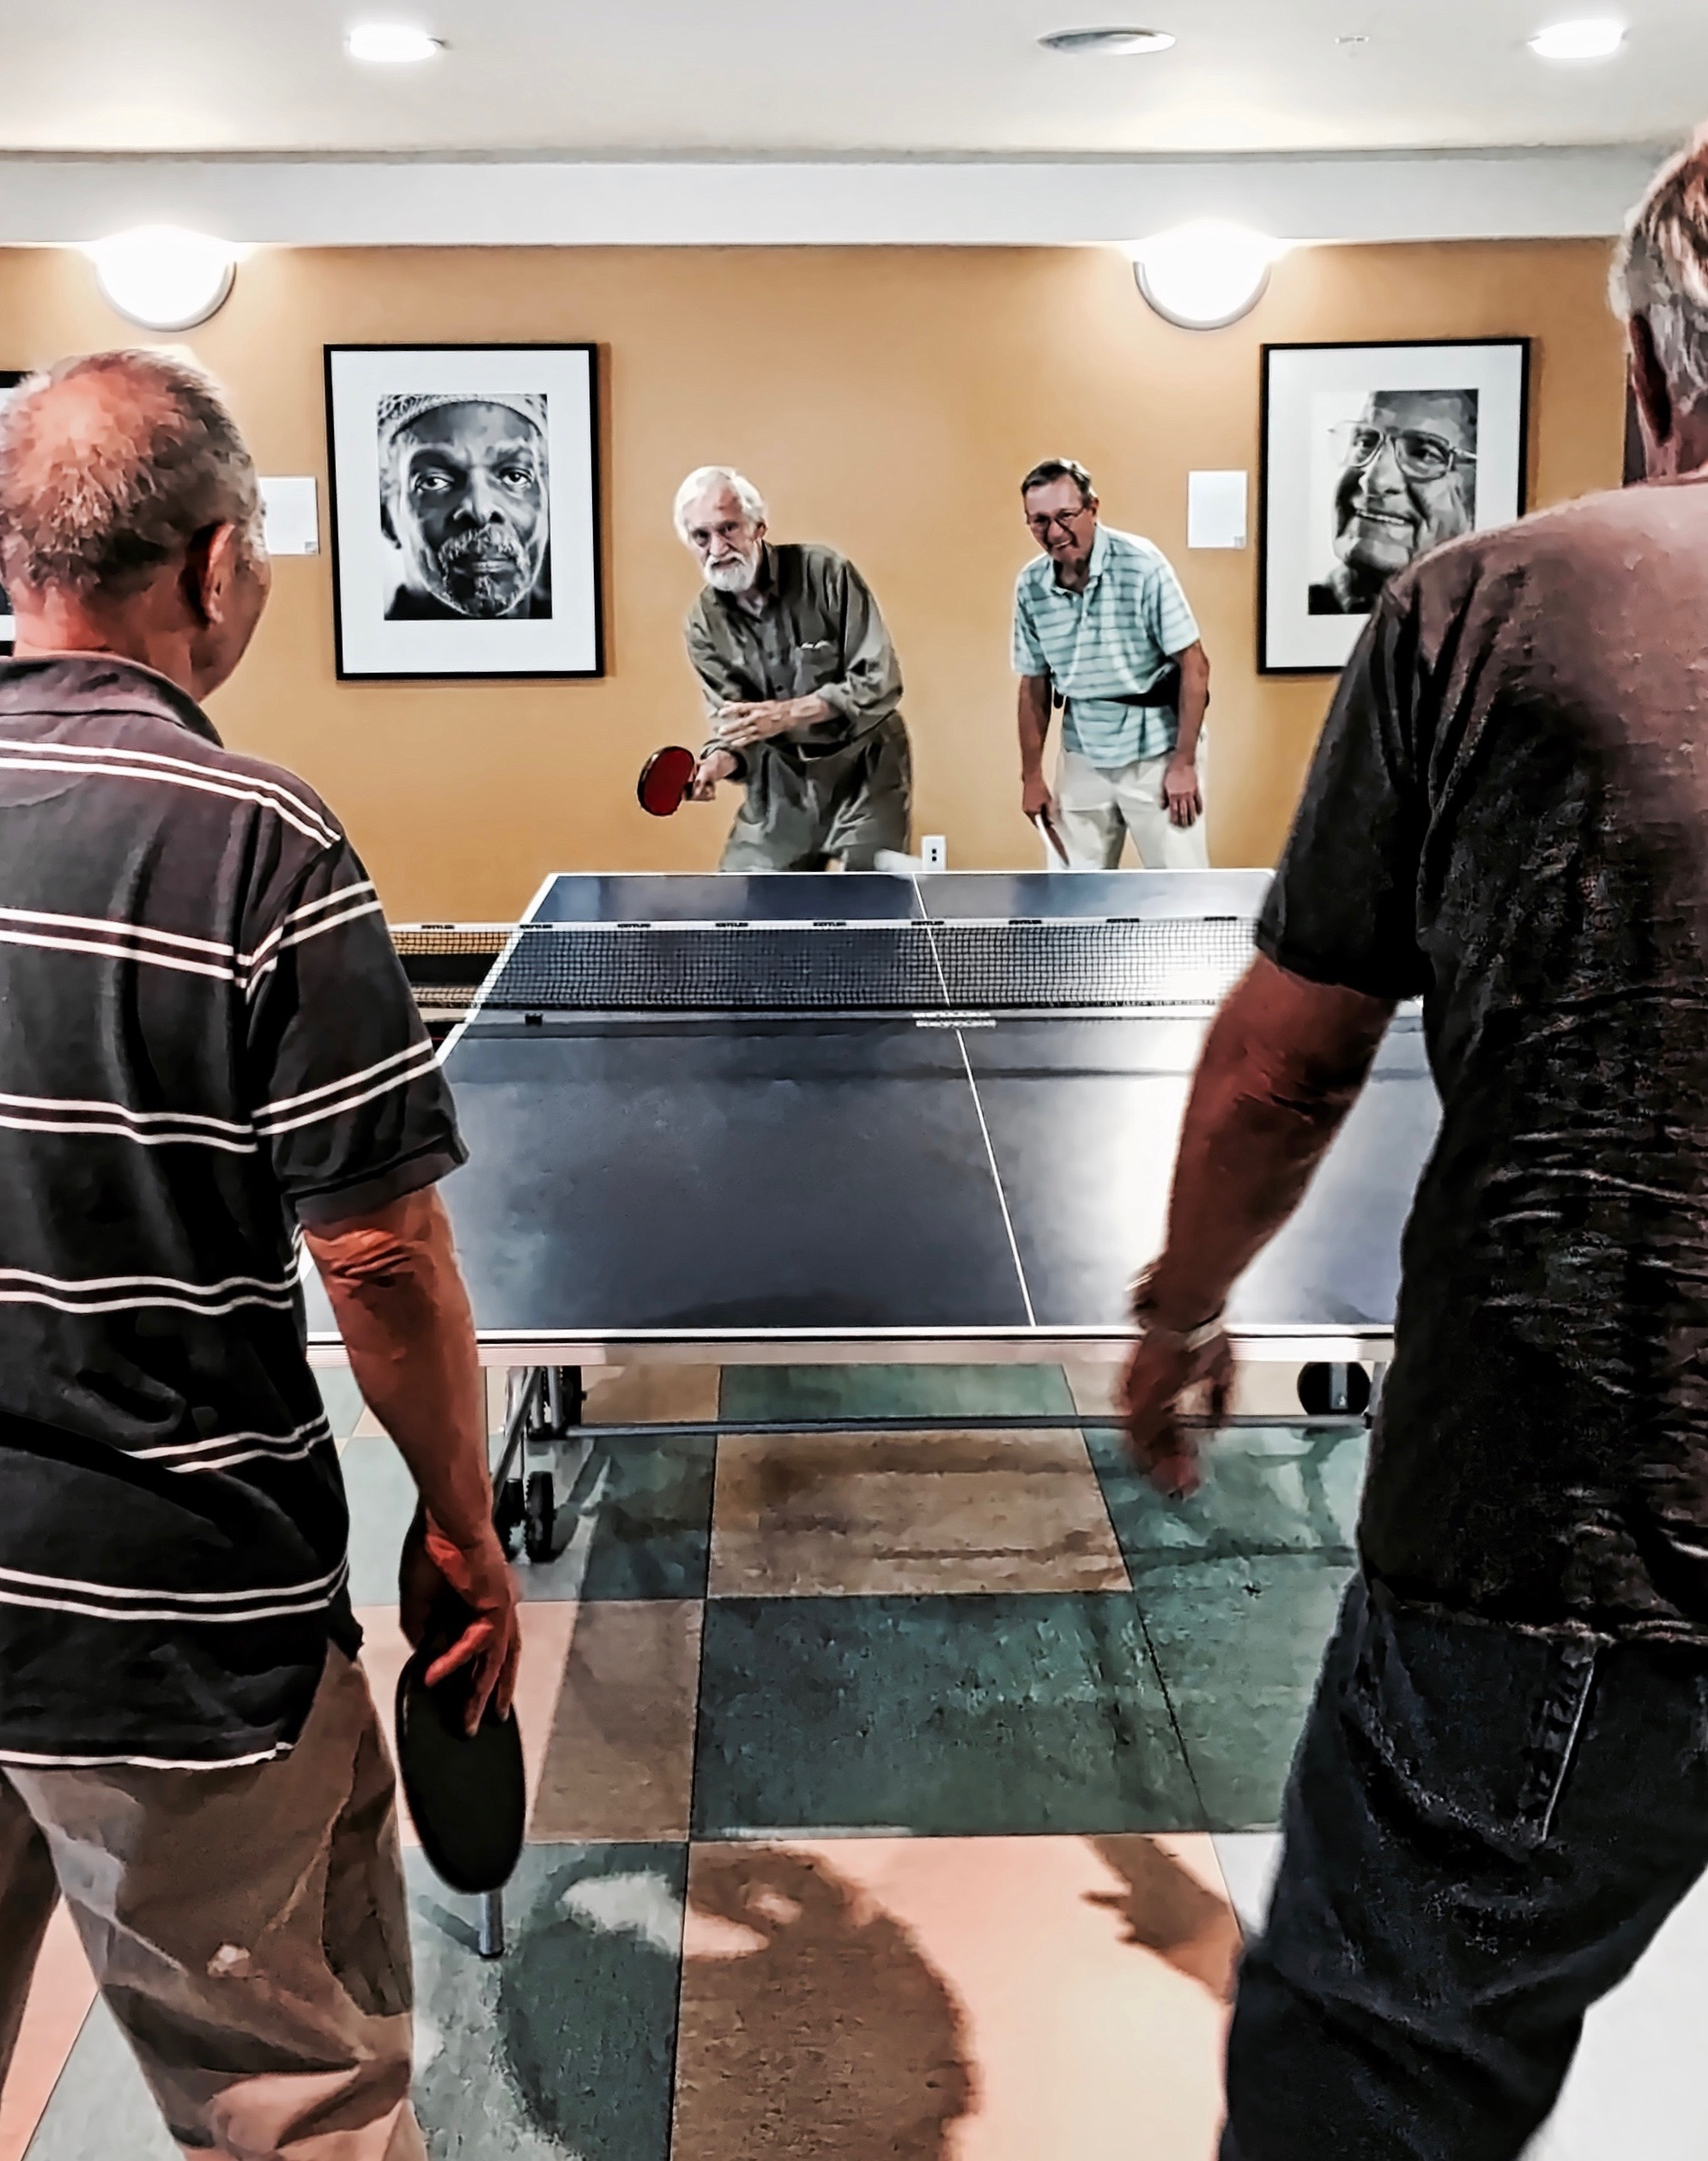 Ping Pong! (LI)